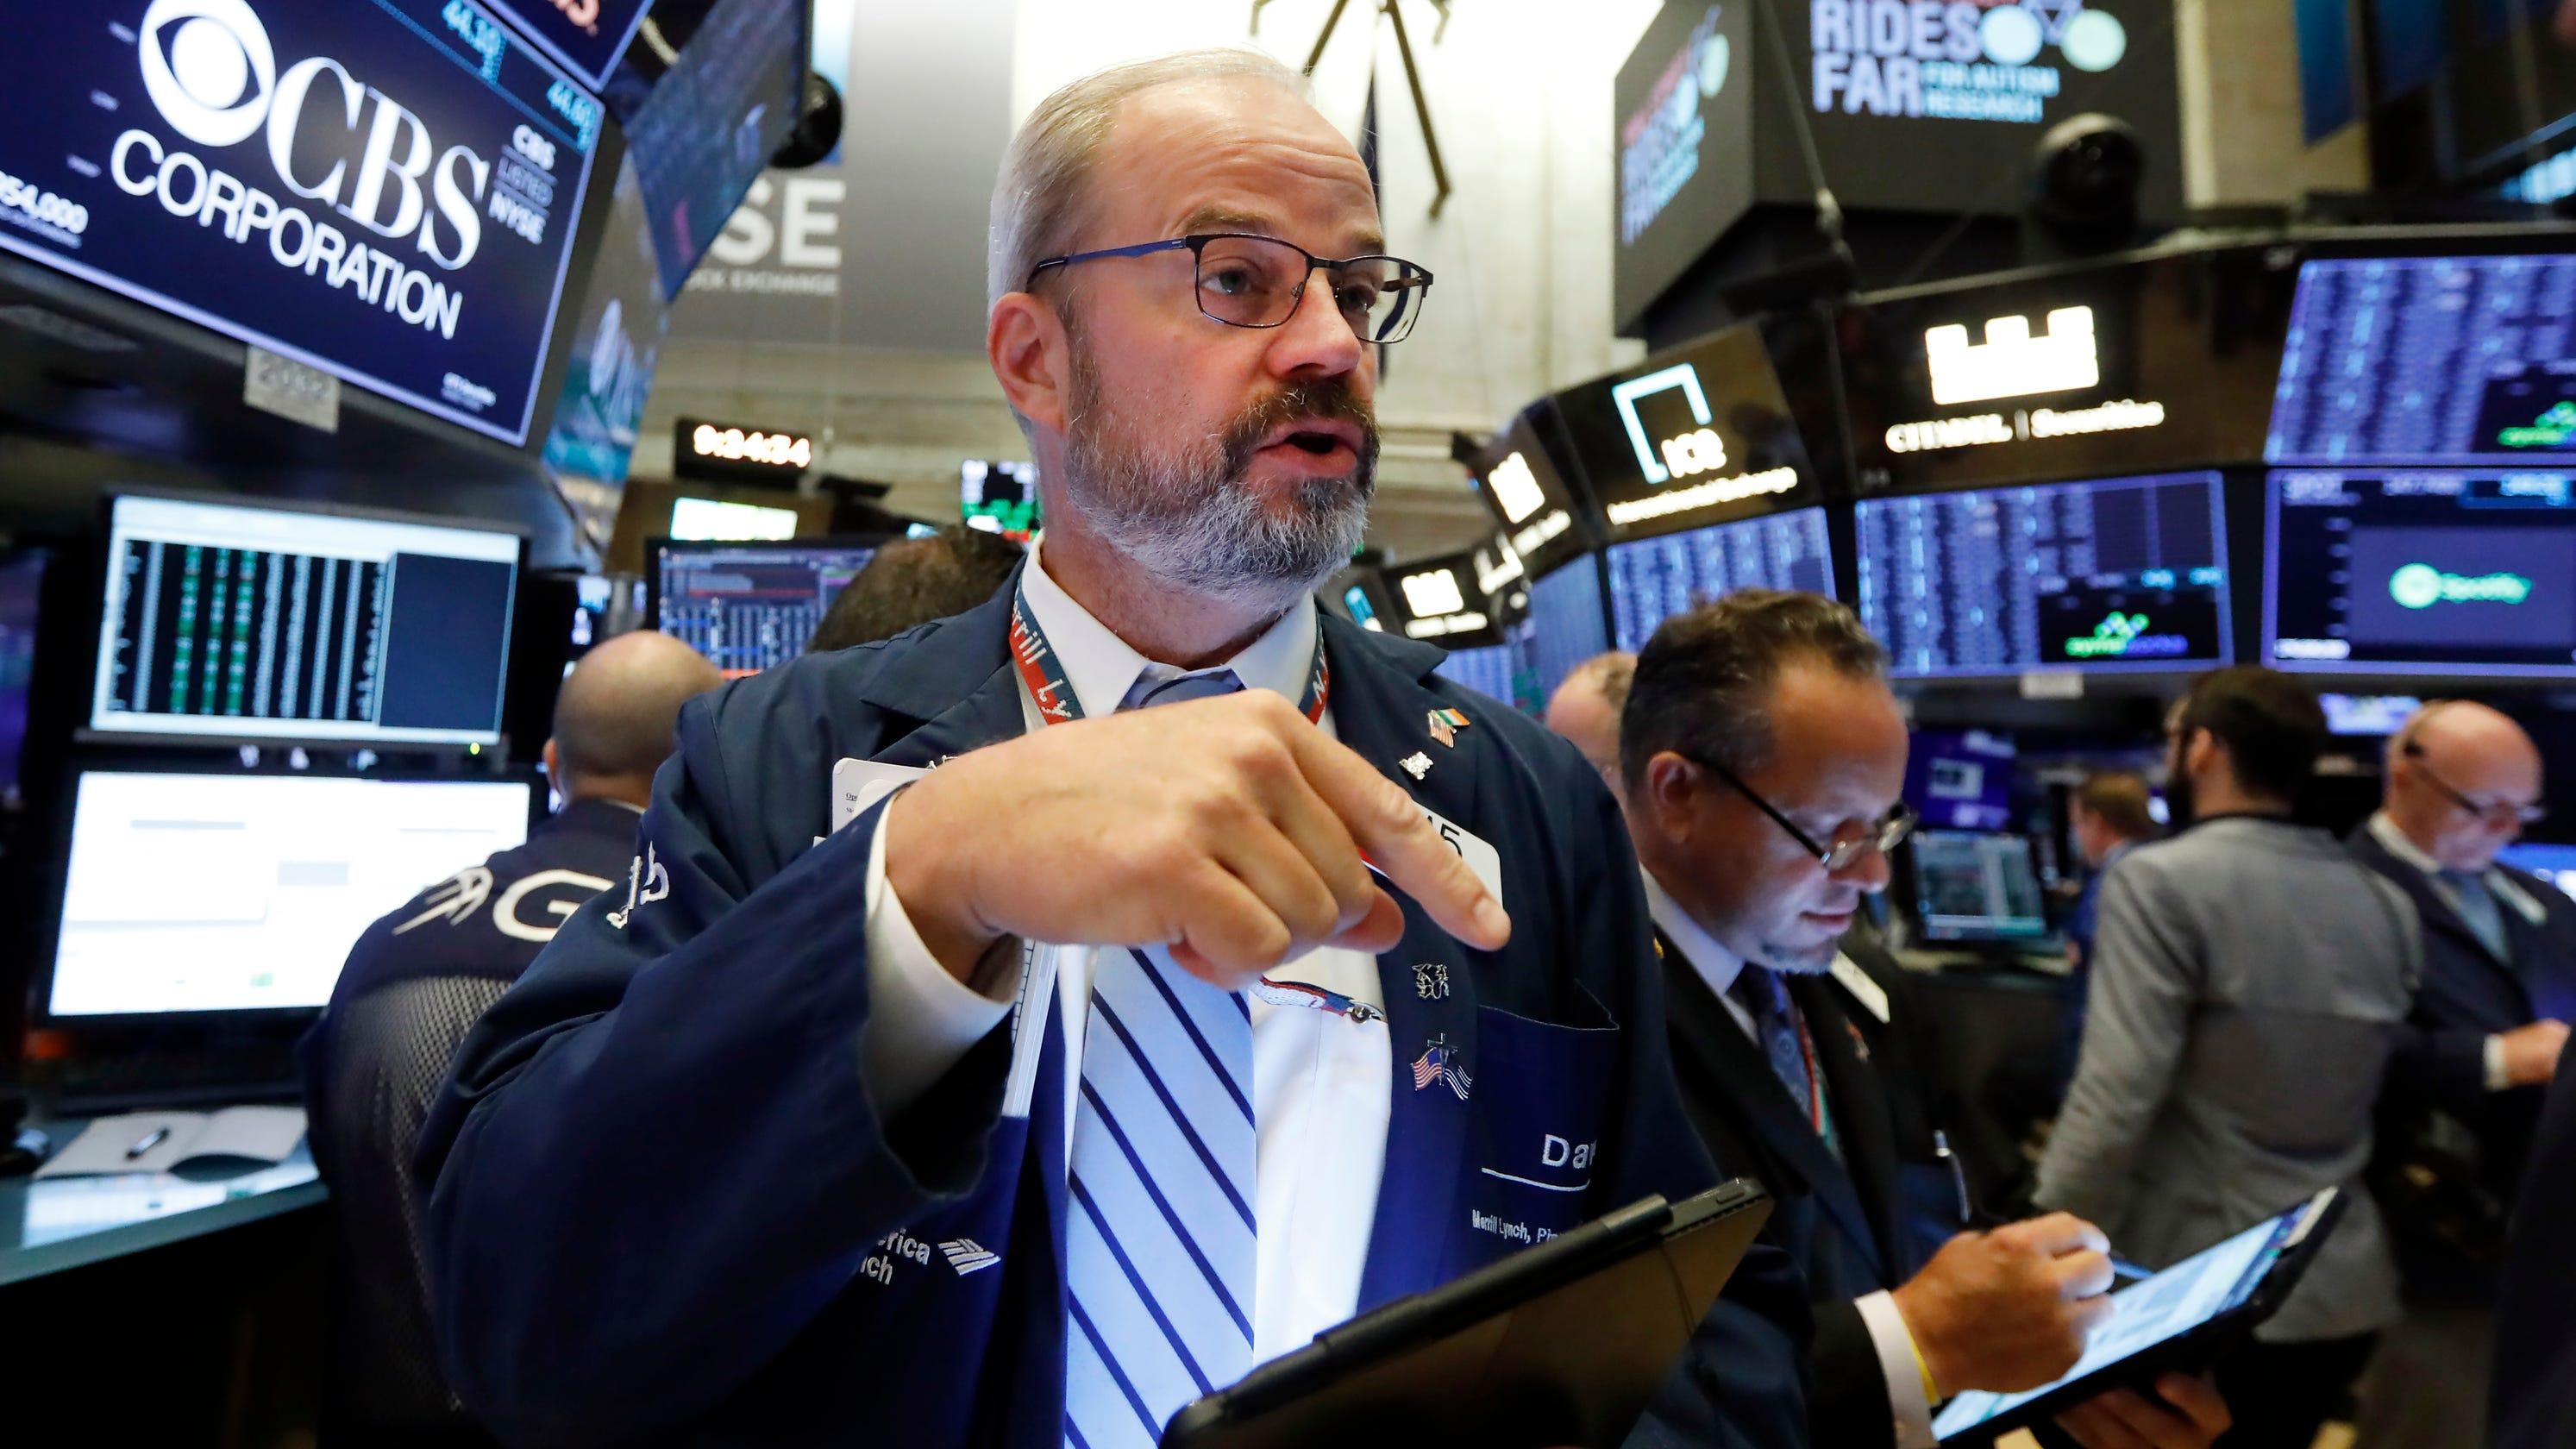 Stocks to open higher on remdesivir treatment